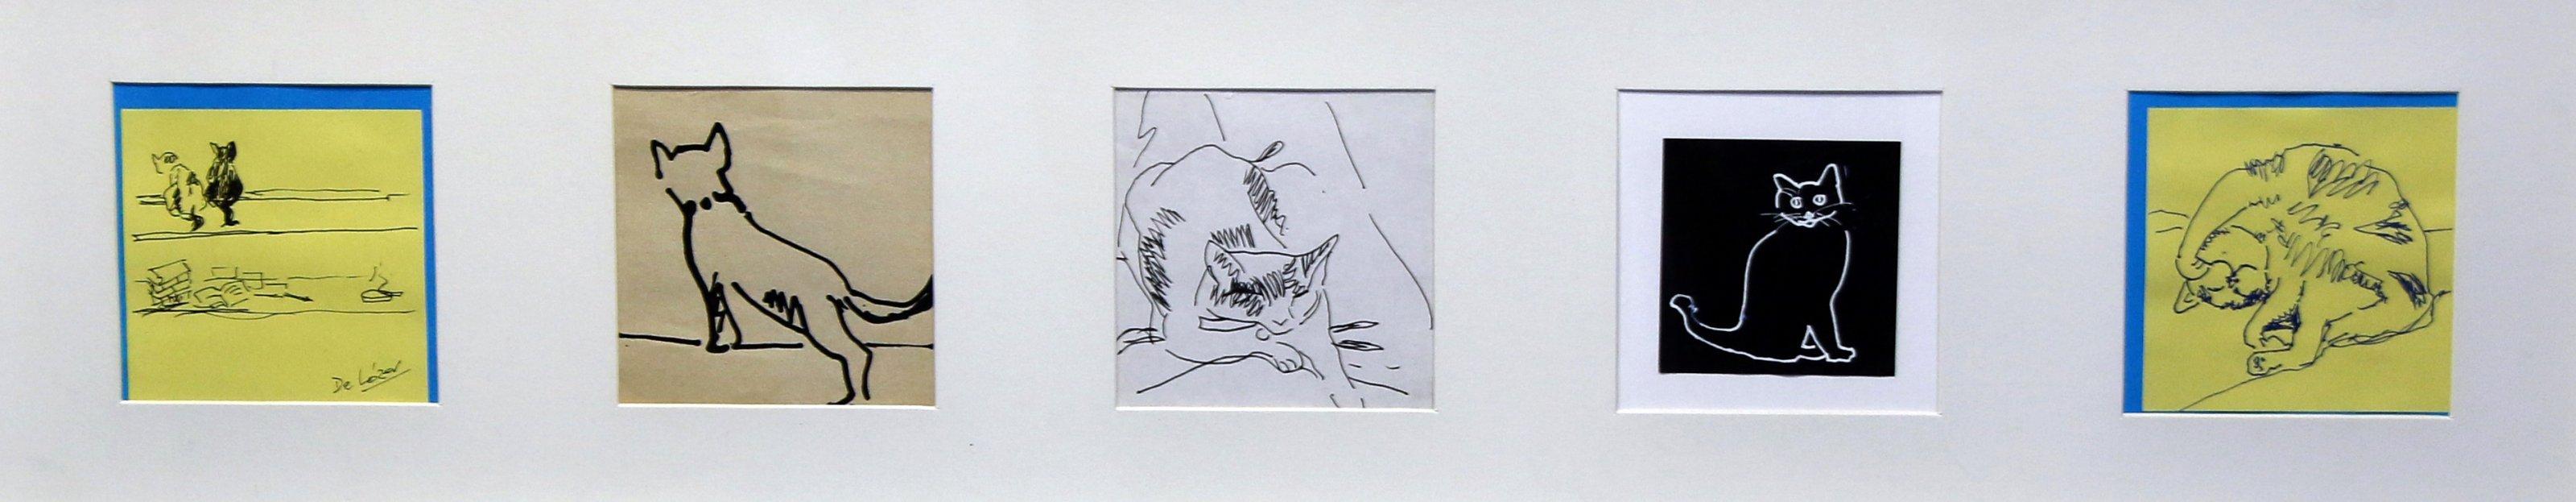 Mis gatos. Cinco dibujos.